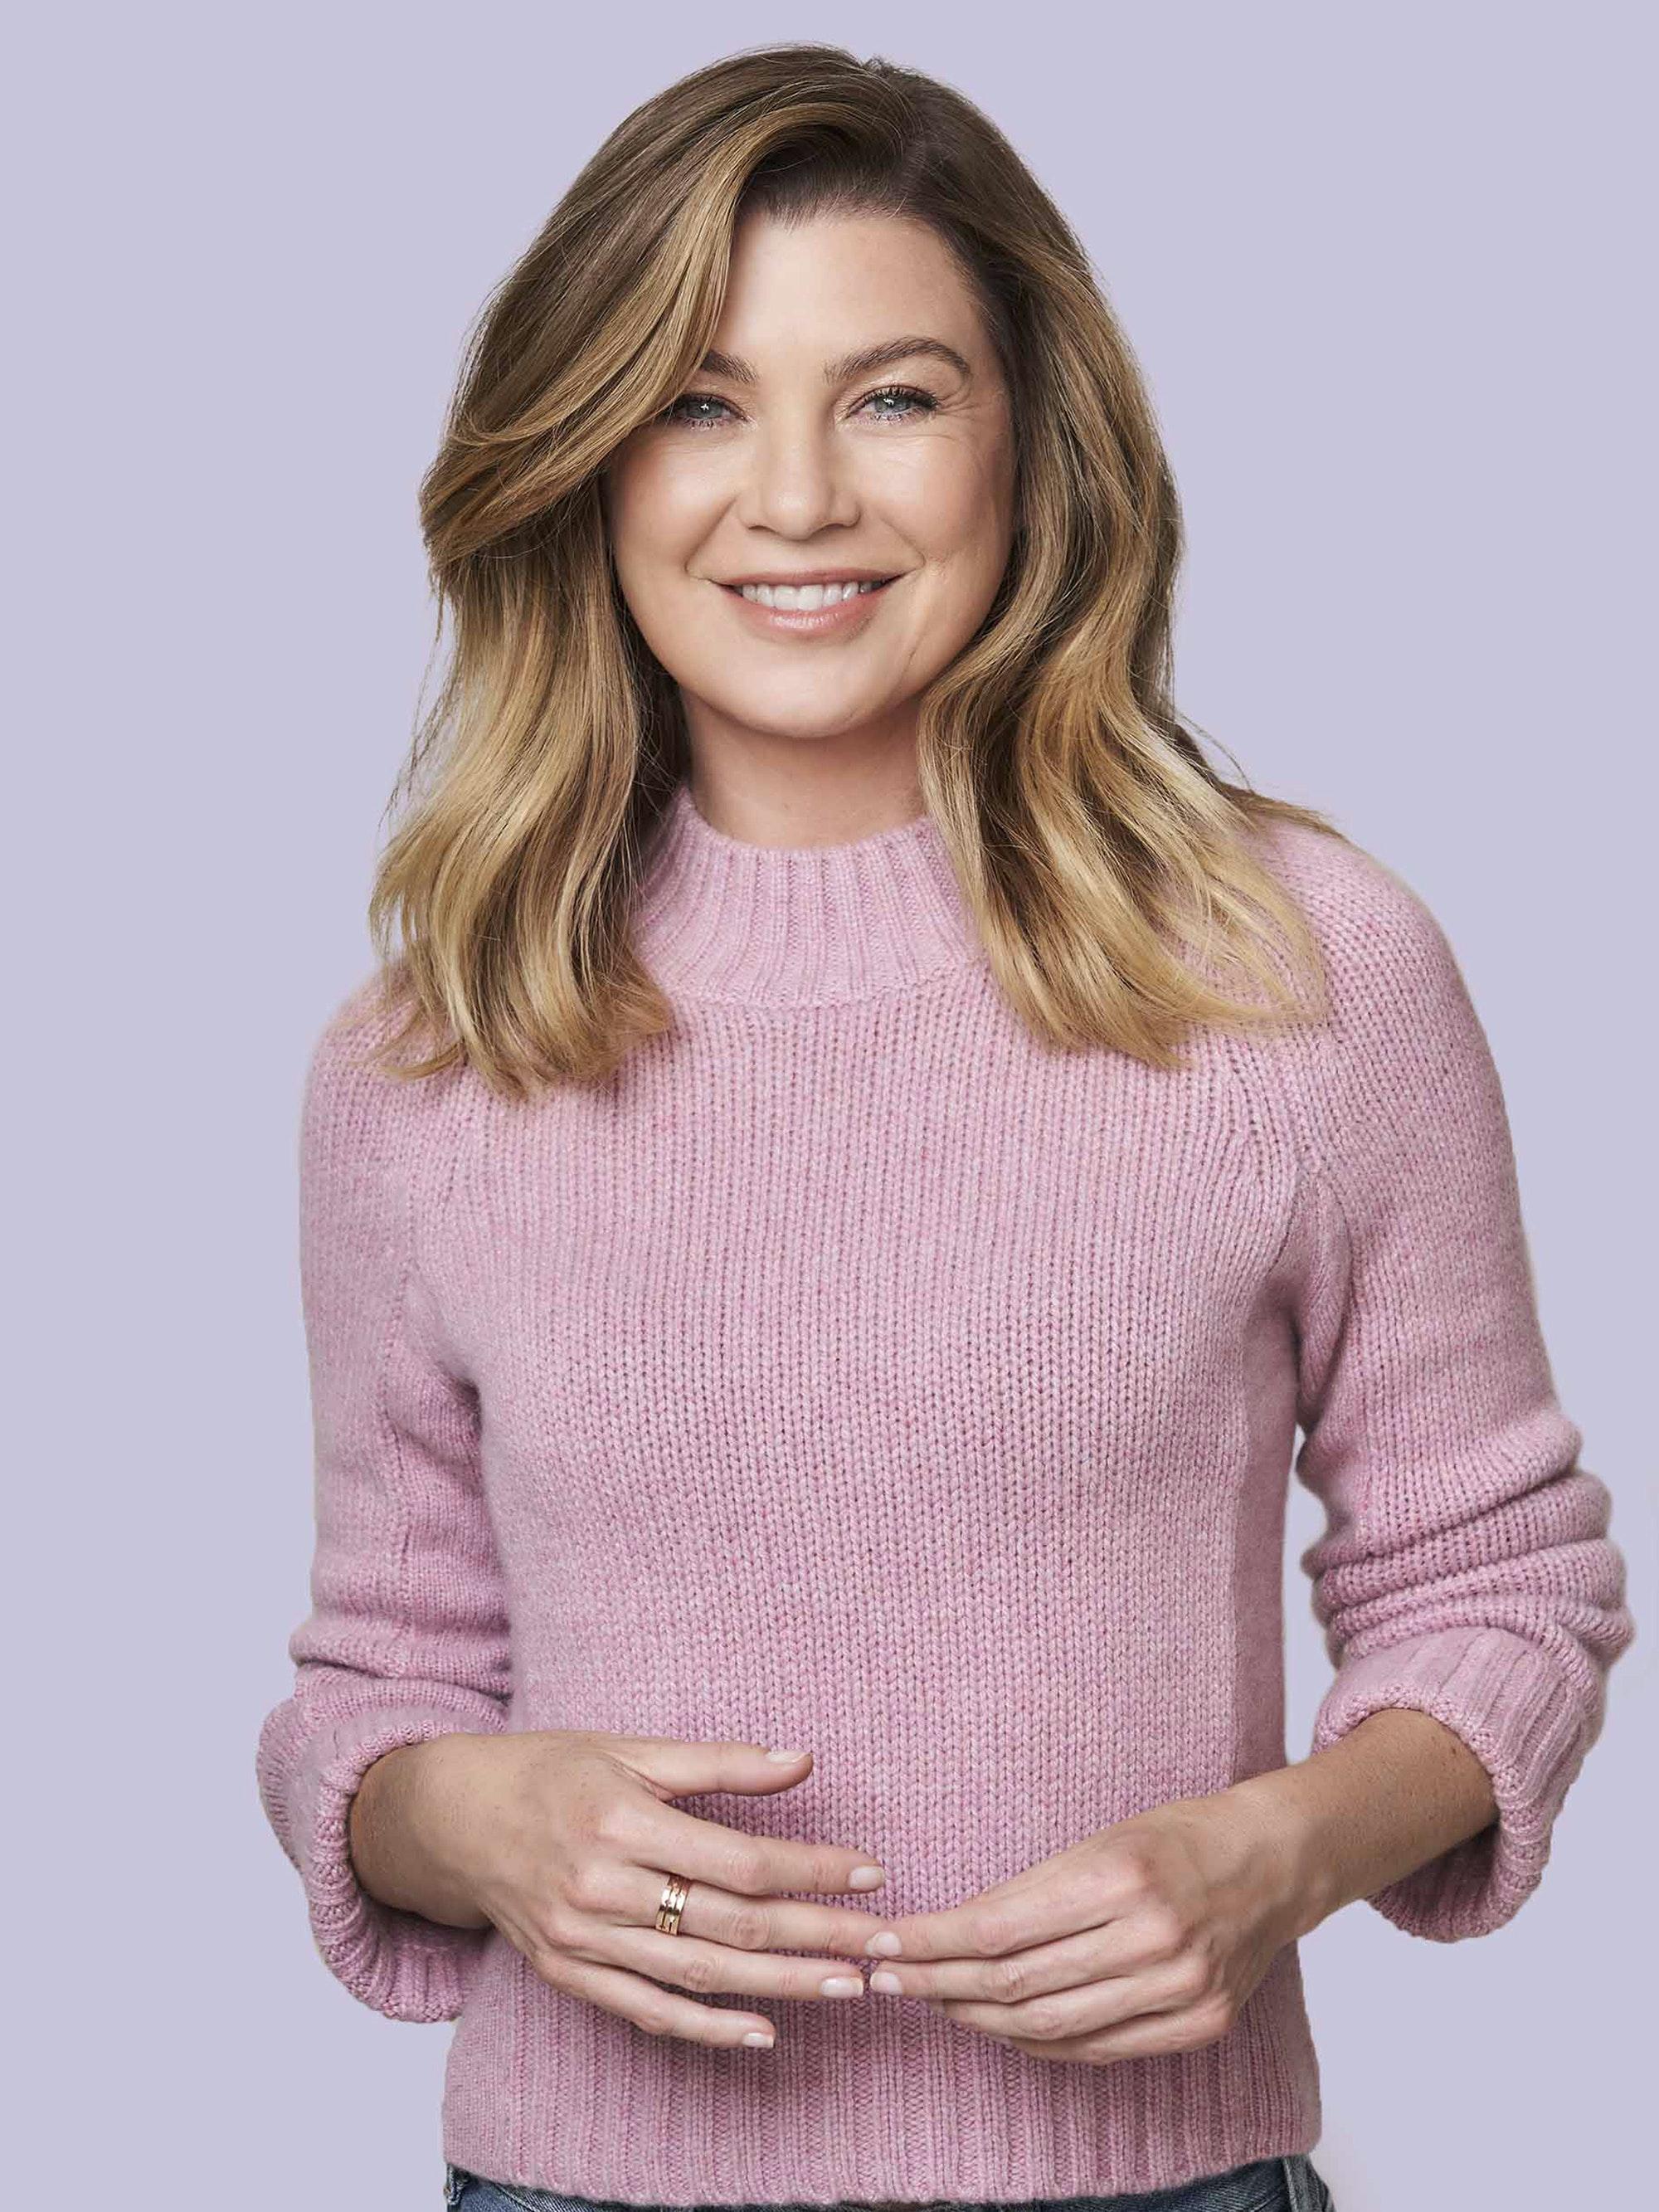 Ellen Pompeo skincare routine